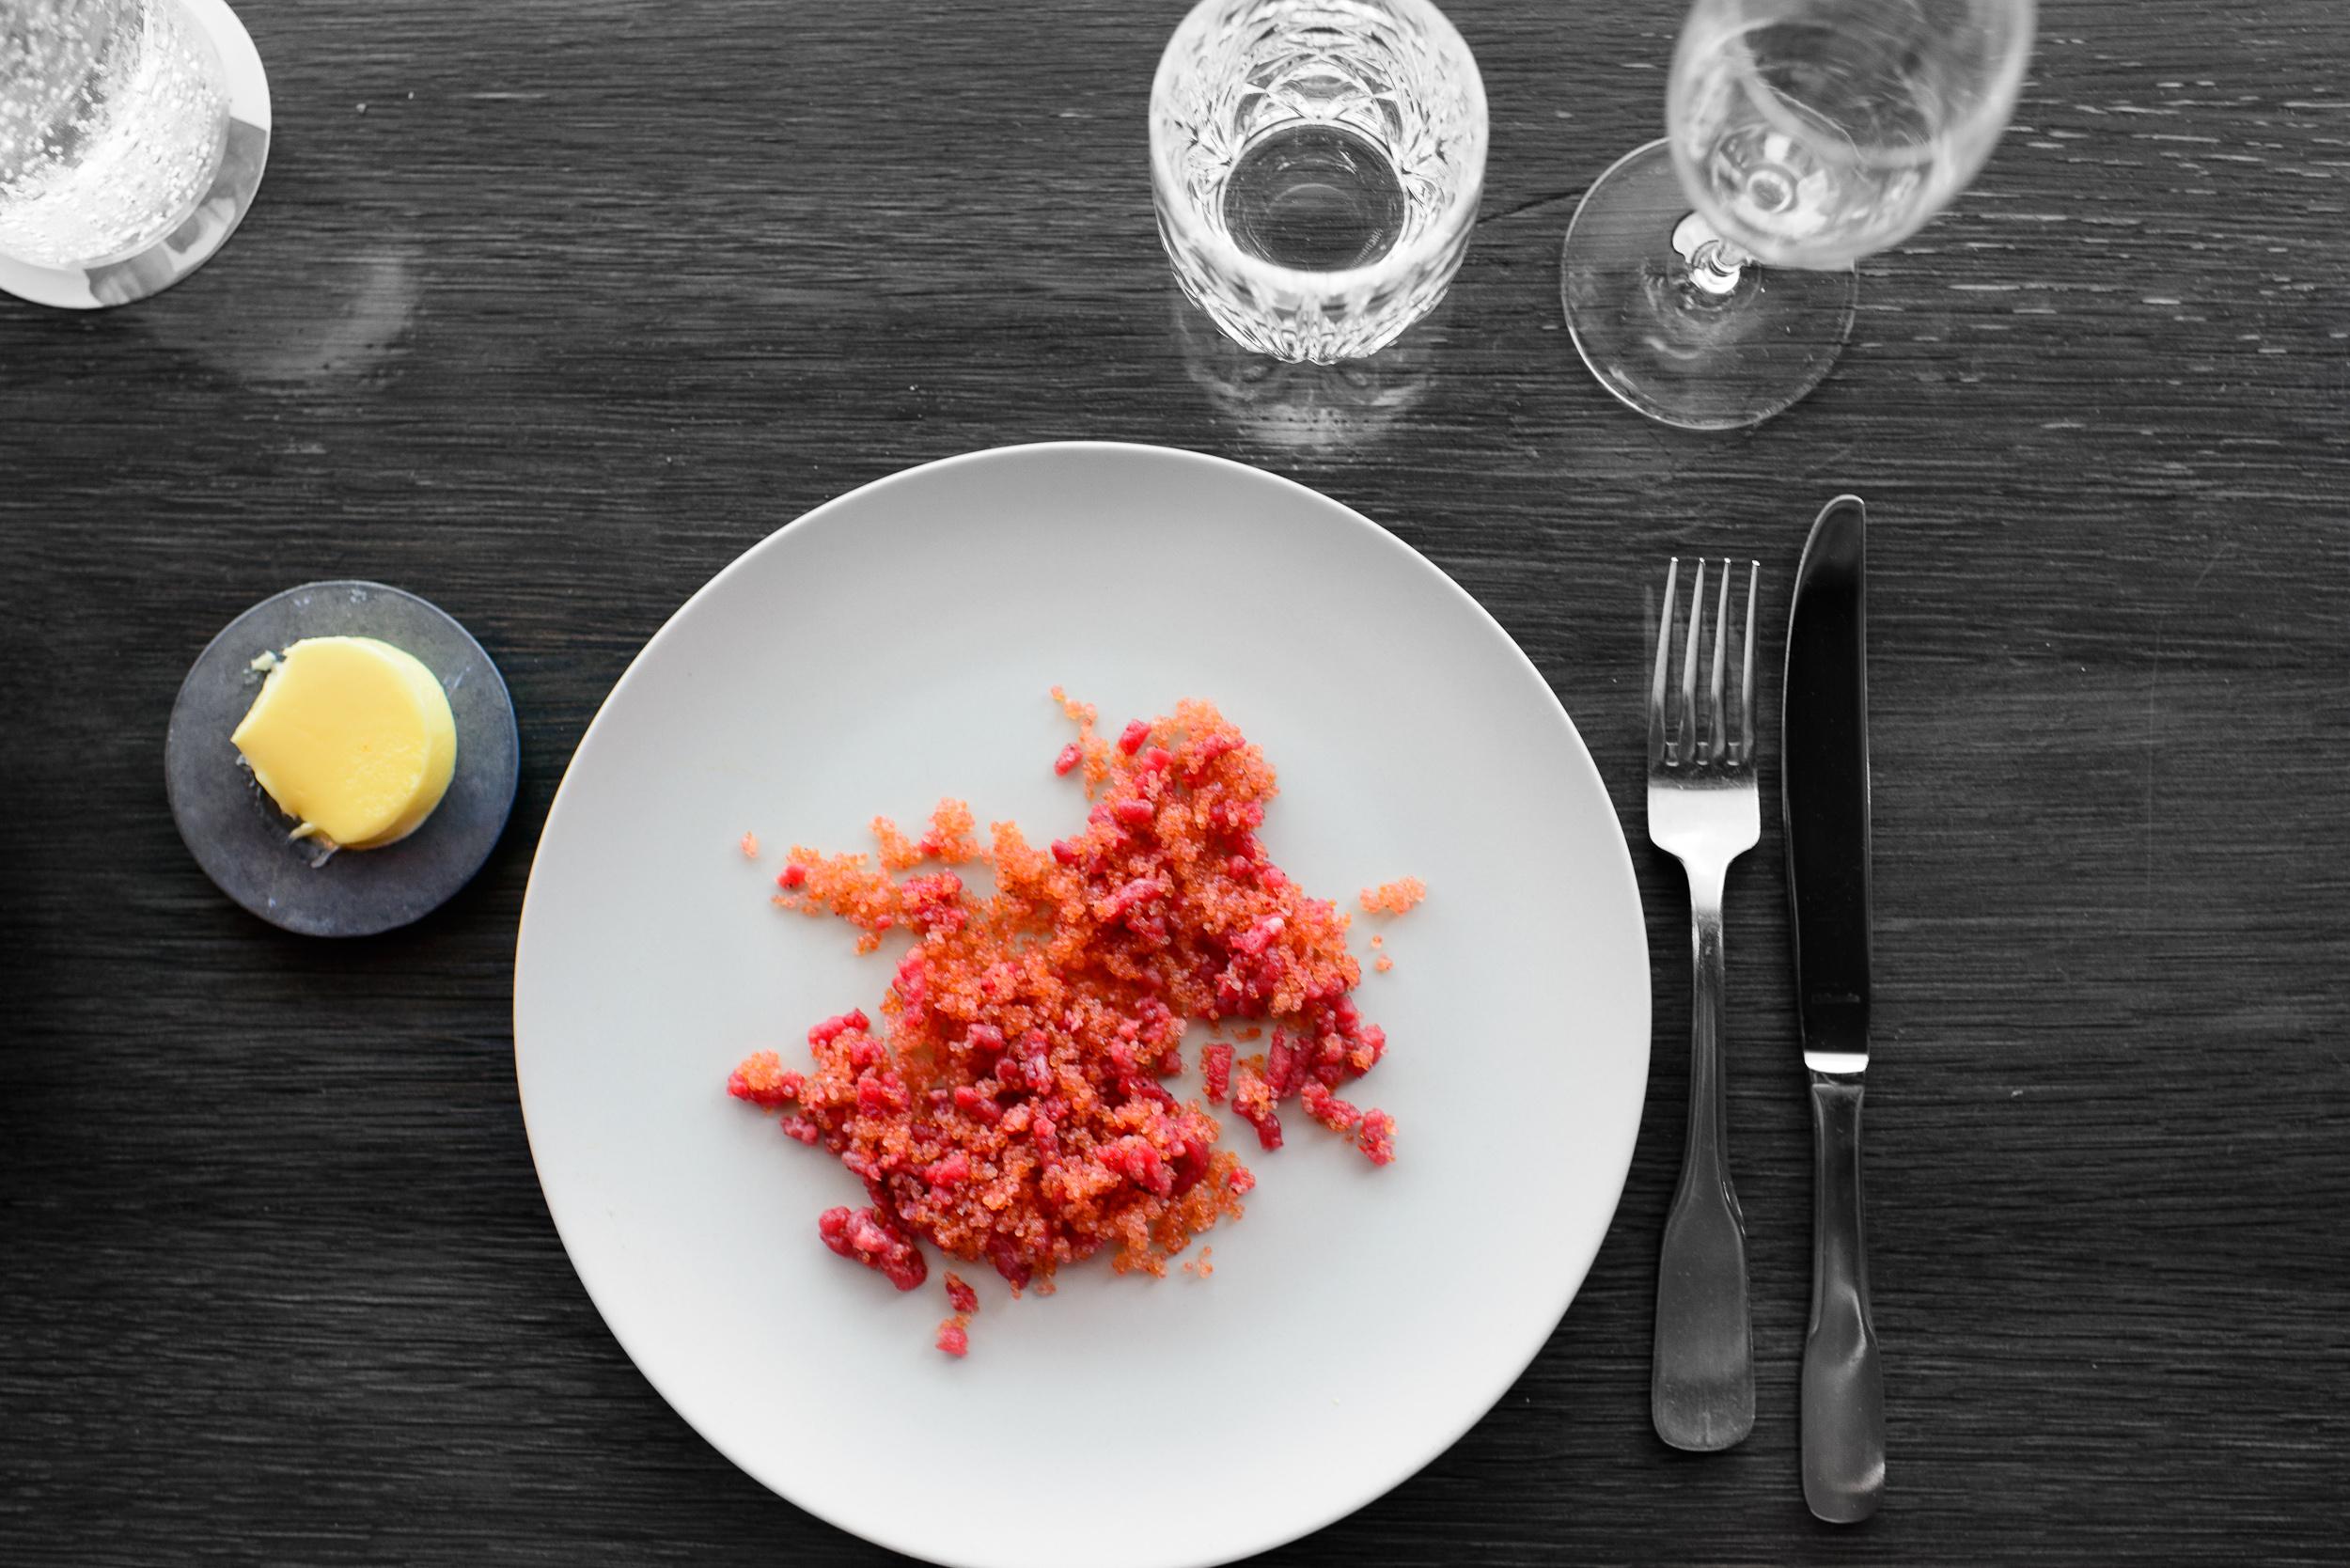 6th Course: Beef tartar, lumpfish roe, chile